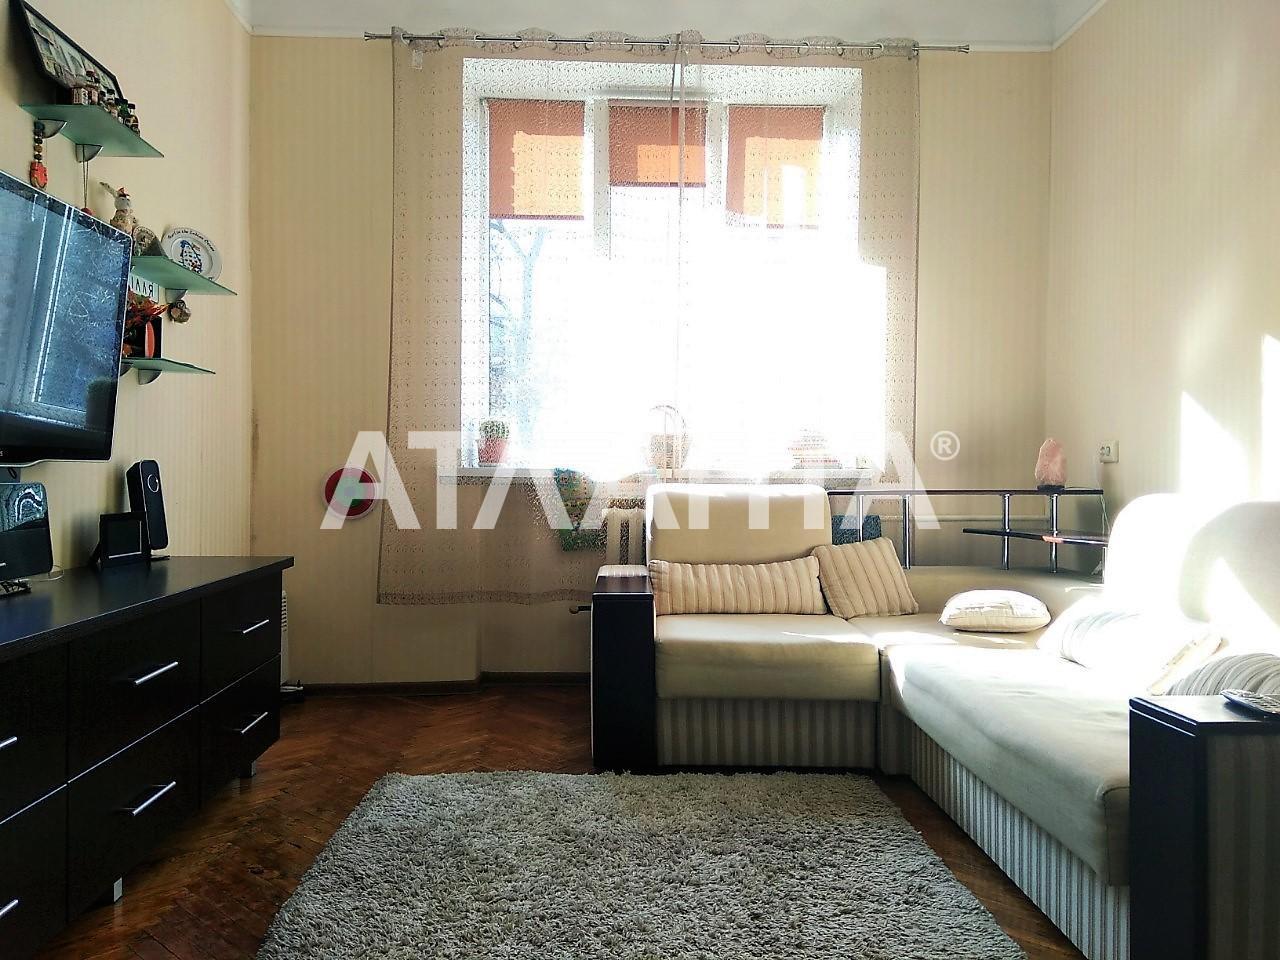 Продается 3-комнатная Квартира на ул. Ул. Семьи Хохловых — 72 000 у.е.